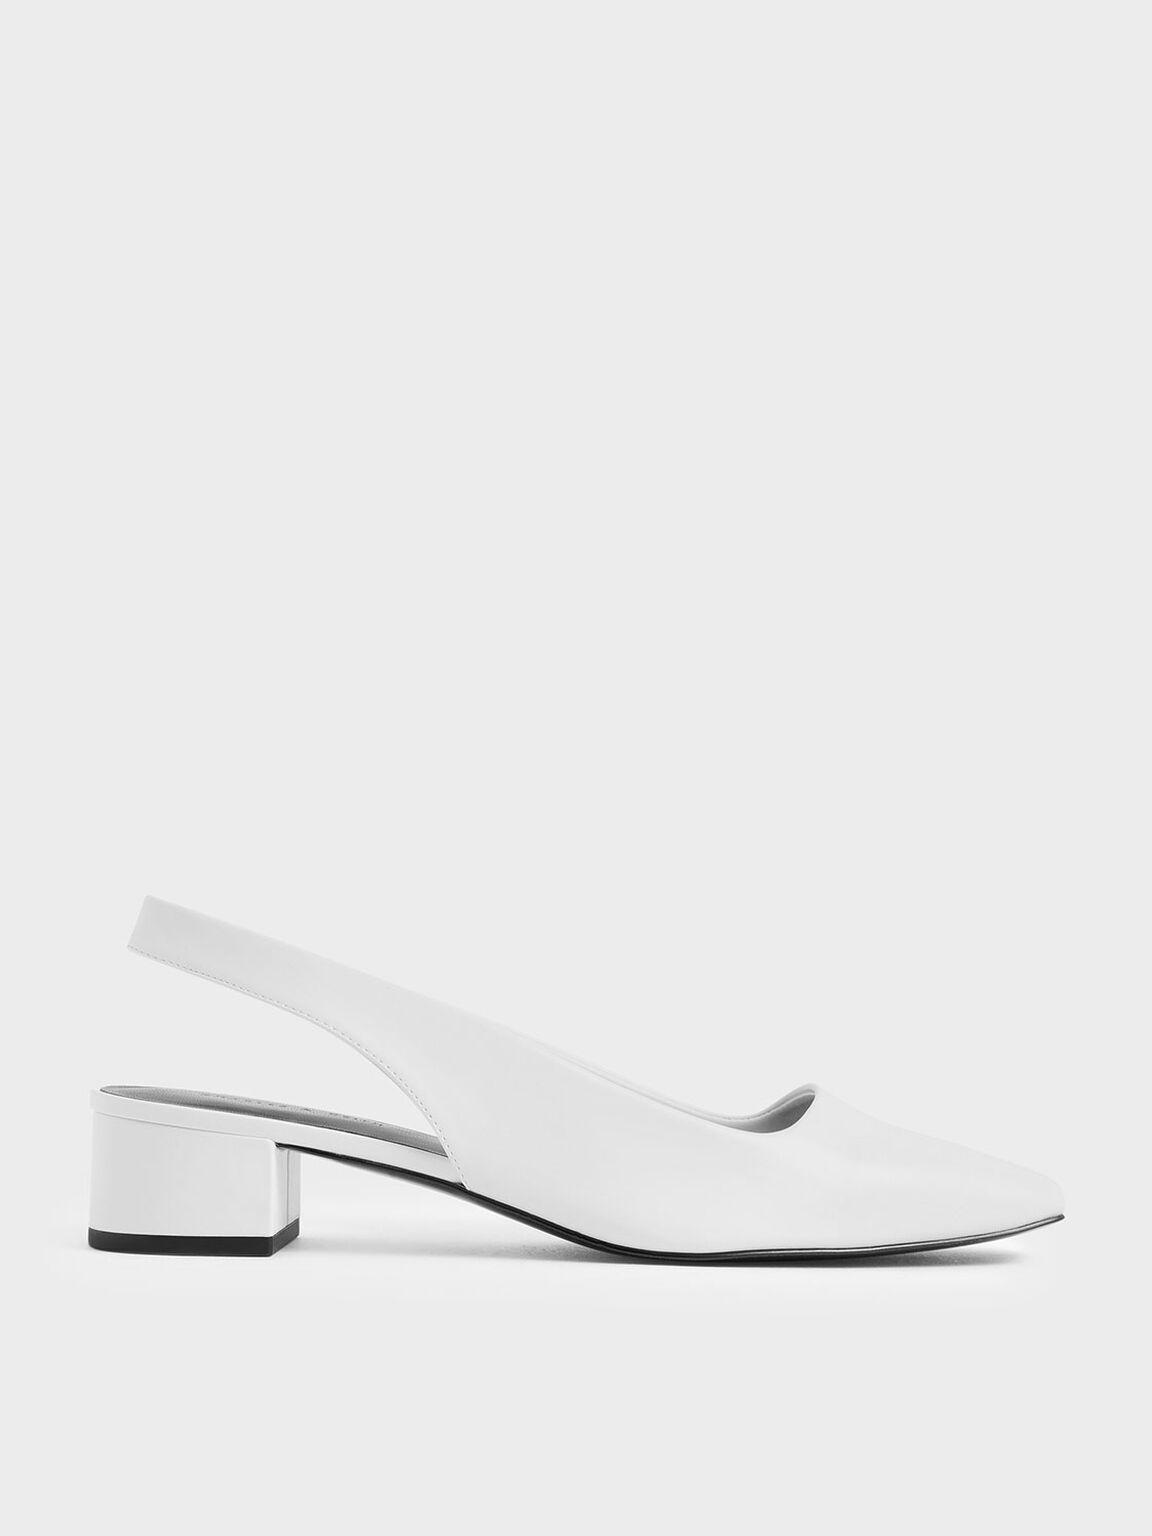 Square Toe Block Heel Slingback Pumps, White, hi-res